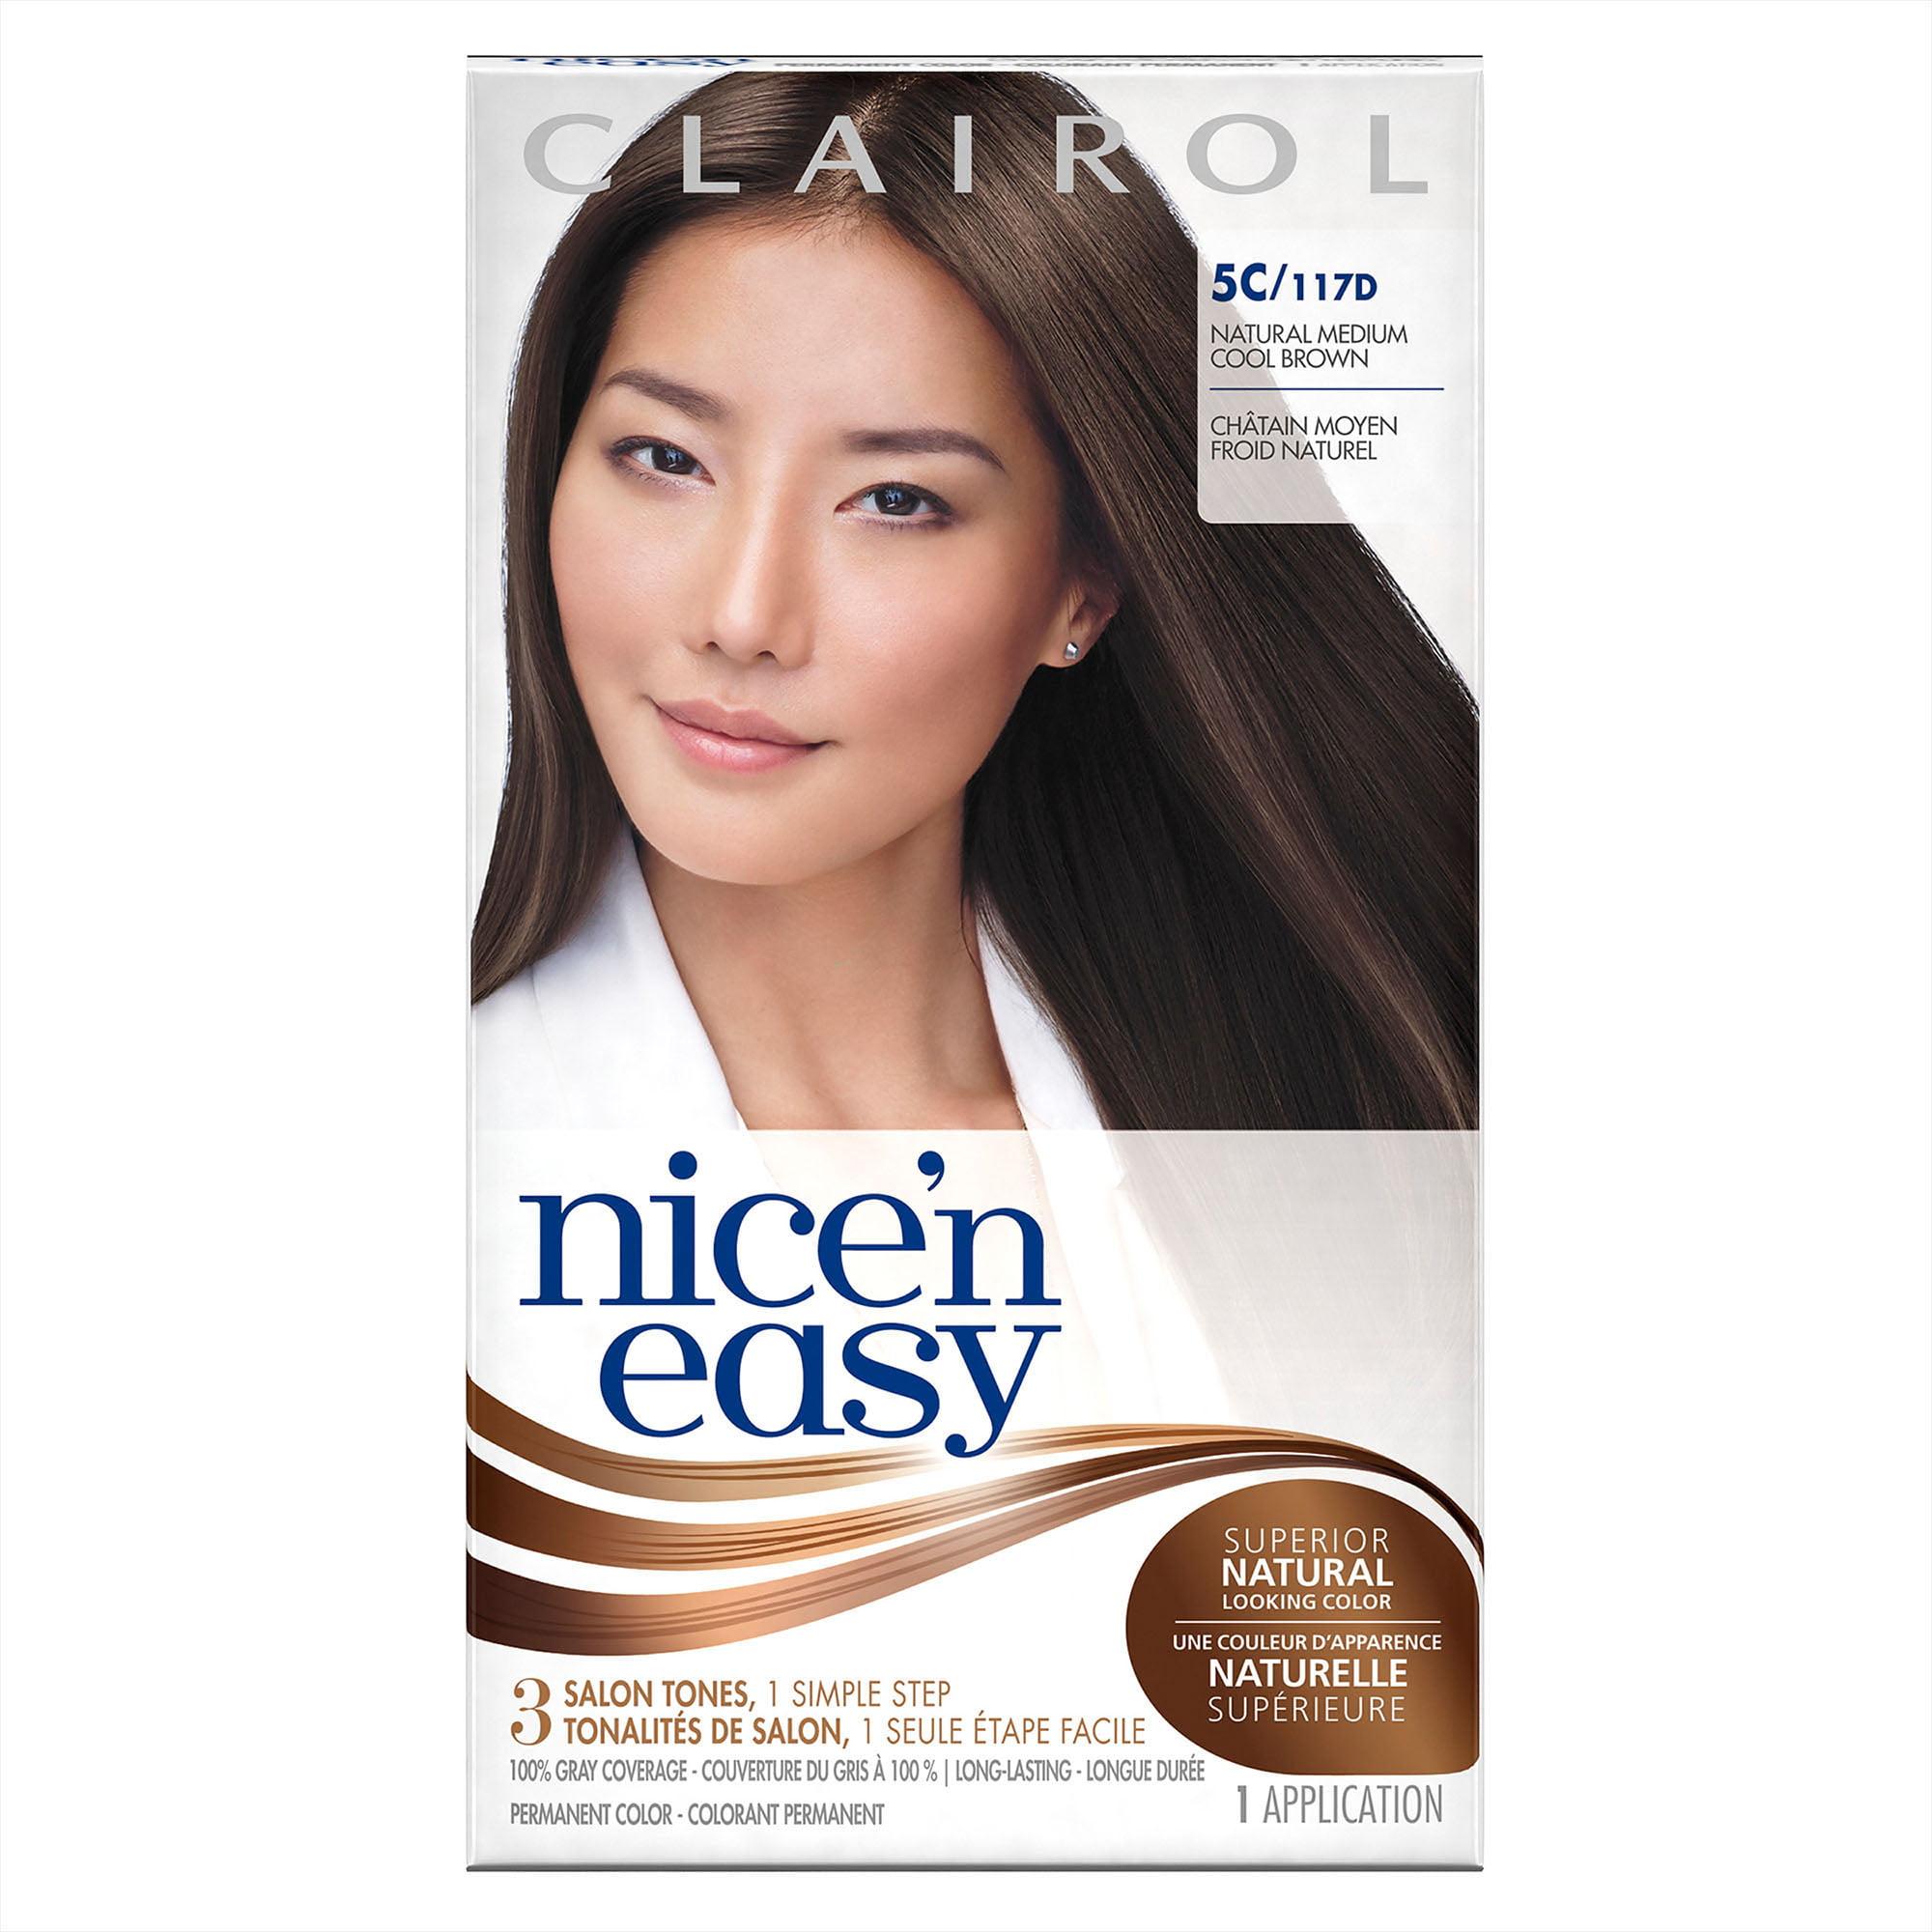 Clairol Nice N Easy Permanent Hair Color 5c117d Medium Cool Brown